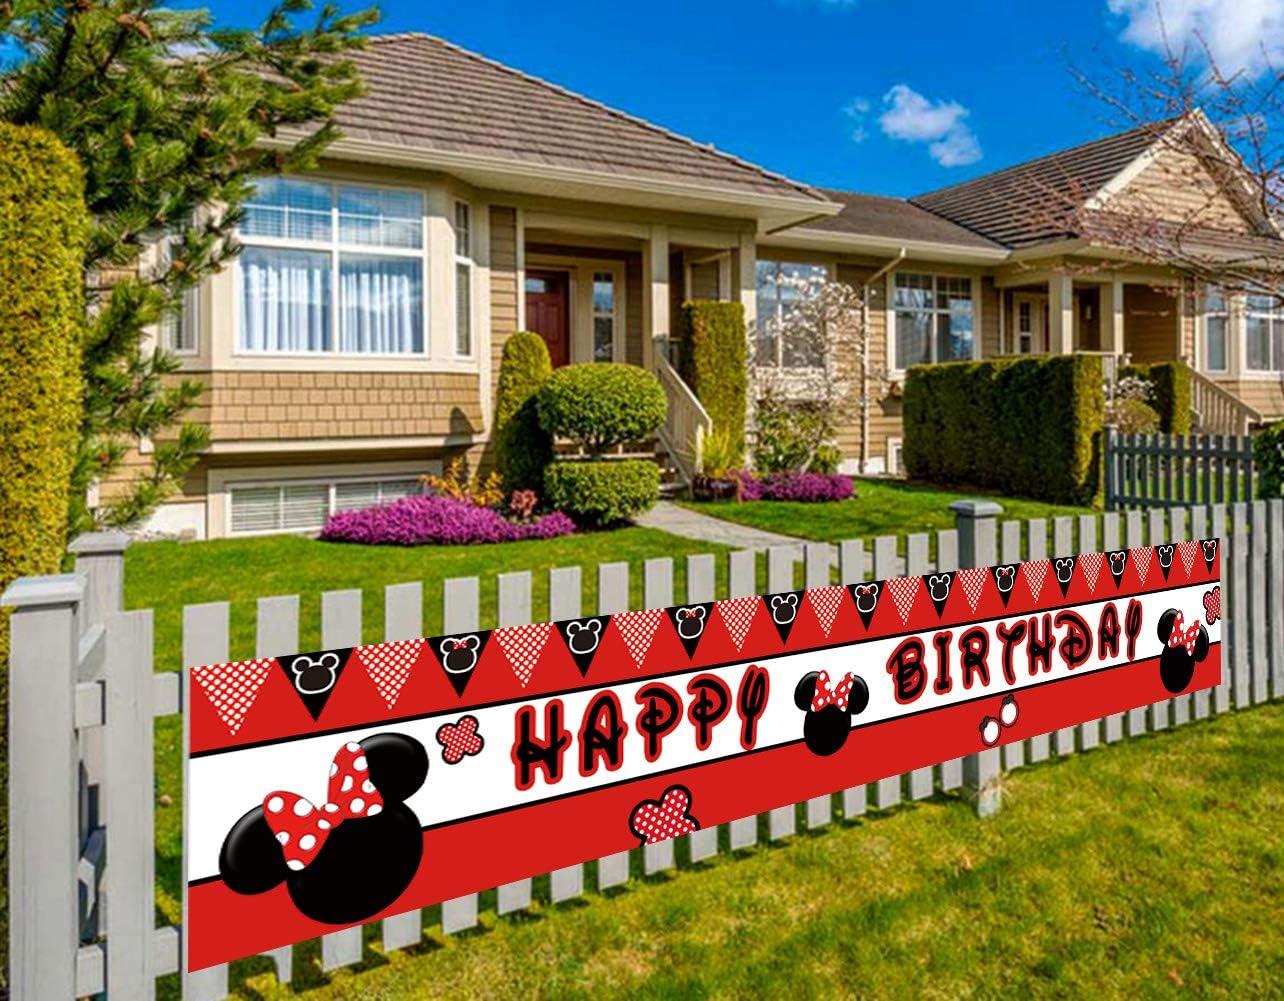 Large Minne Mouse Happy Birthday Banner, Minne Mouse Clubhouse Birthday Party Banner Supplies Decorations (9.8 x 1.5 feet)